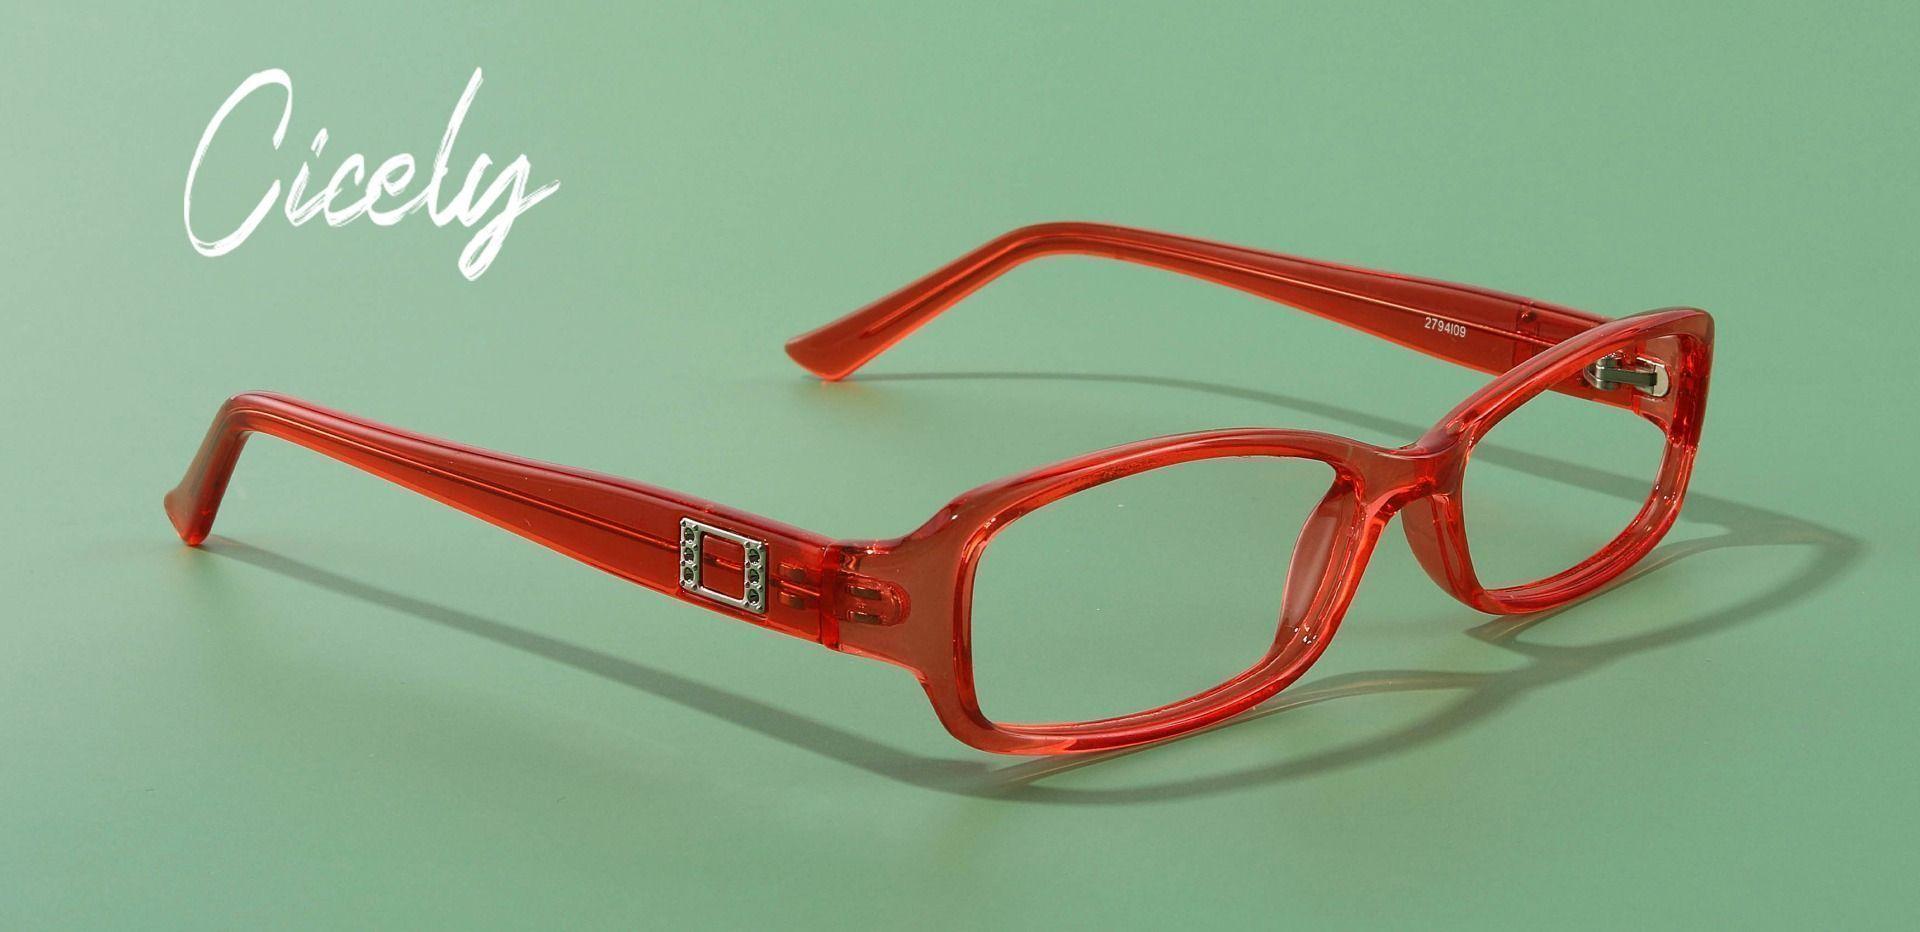 Cicely Rectangle Single Vision Glasses - Orange Crystal